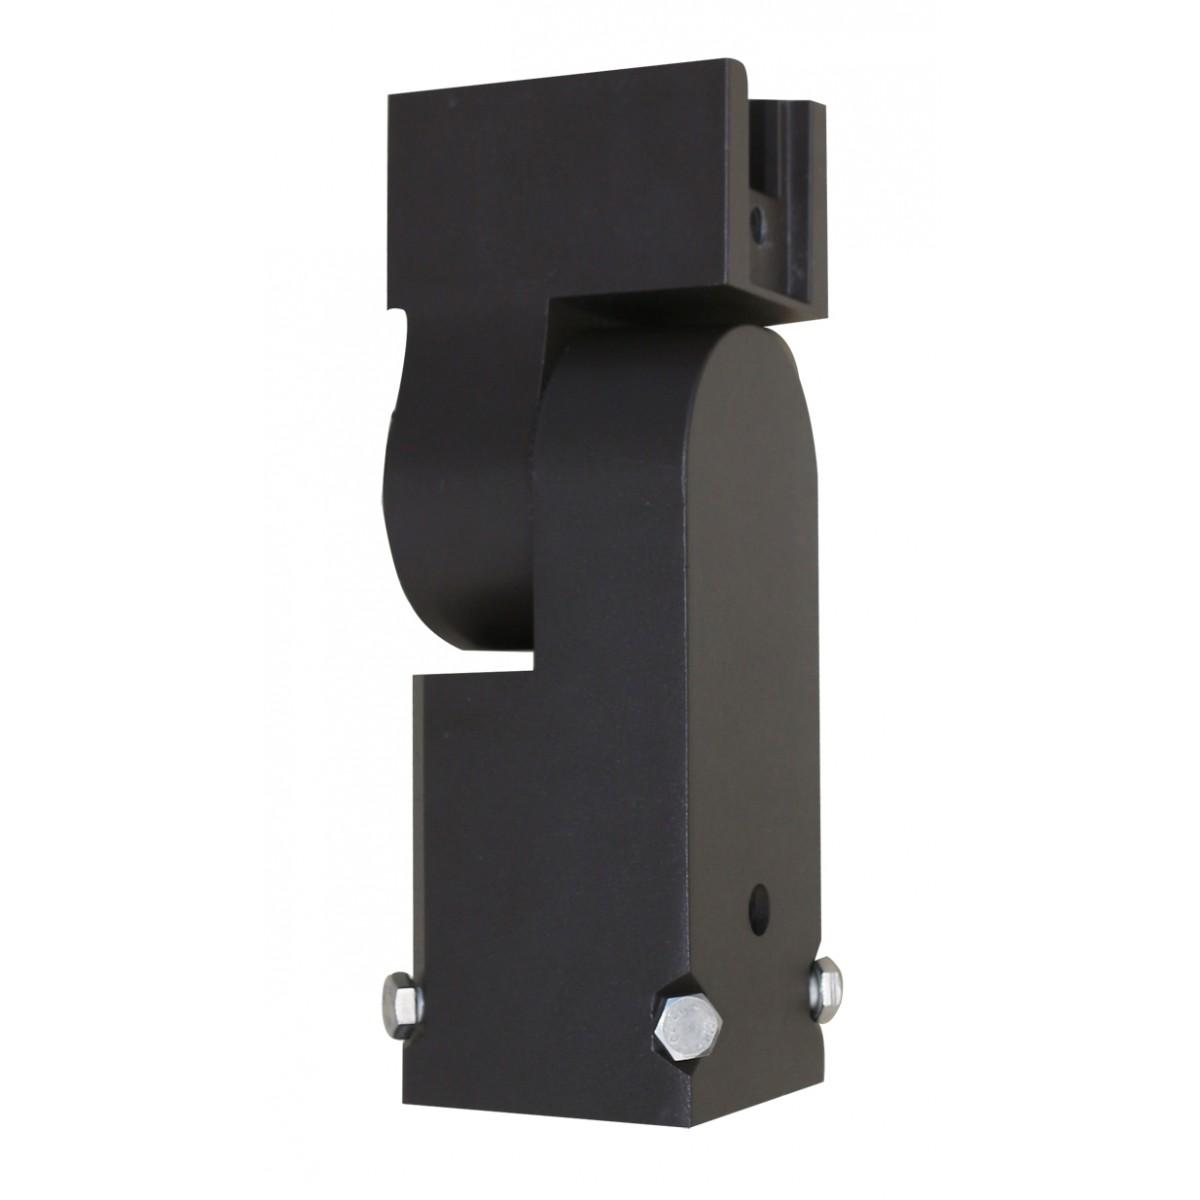 Home Audio Wiring Accessories Schematic Diagrams Supplies Sf Block And U2022 Purple Car